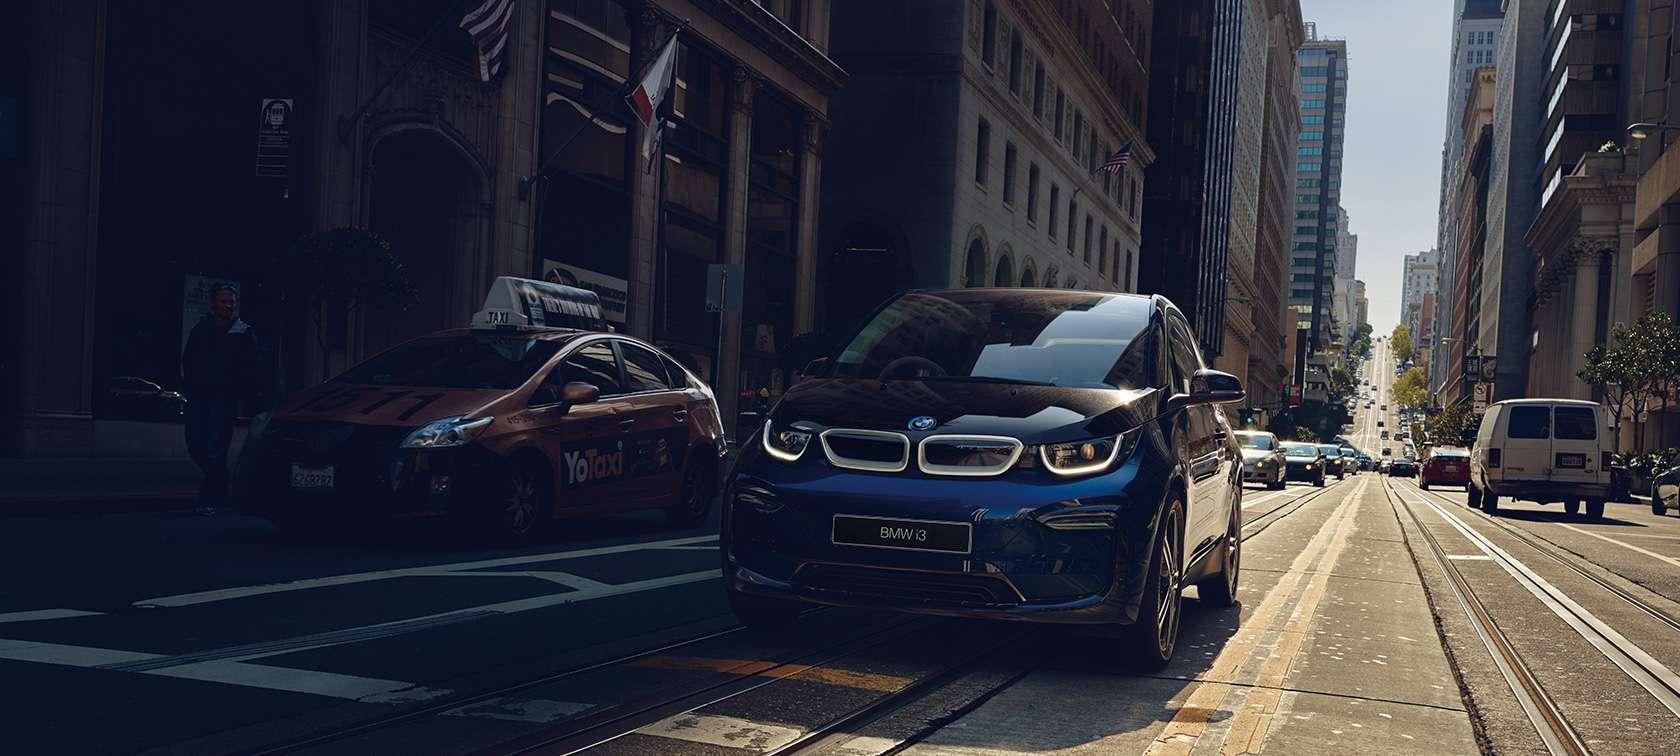 BMWジャパンが本気!?BMW i3を驚きの特別残価・据置率、低金利で販売^^50台限り!